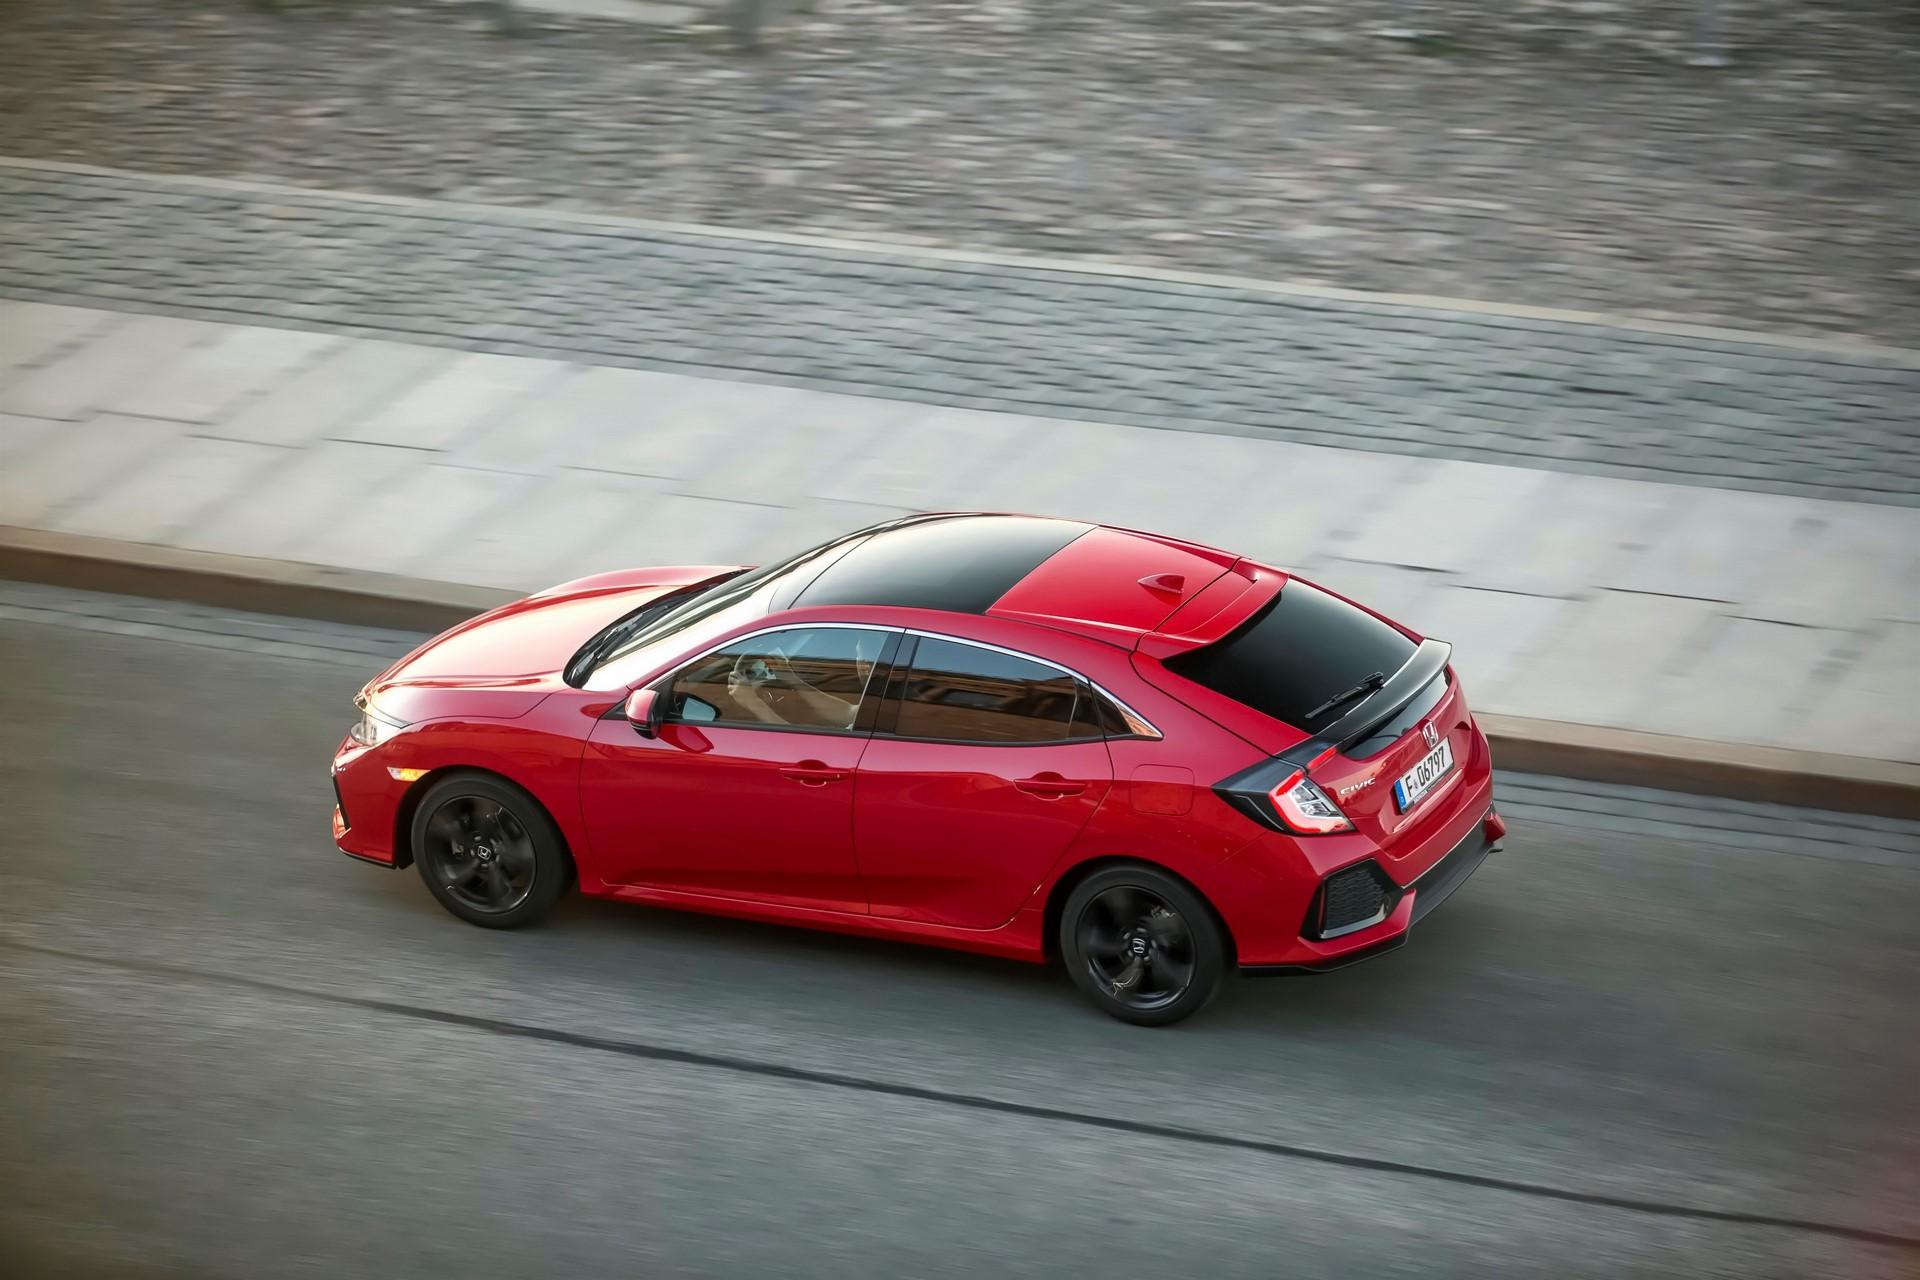 Upgraded diesel engine joins Honda Civic line-up